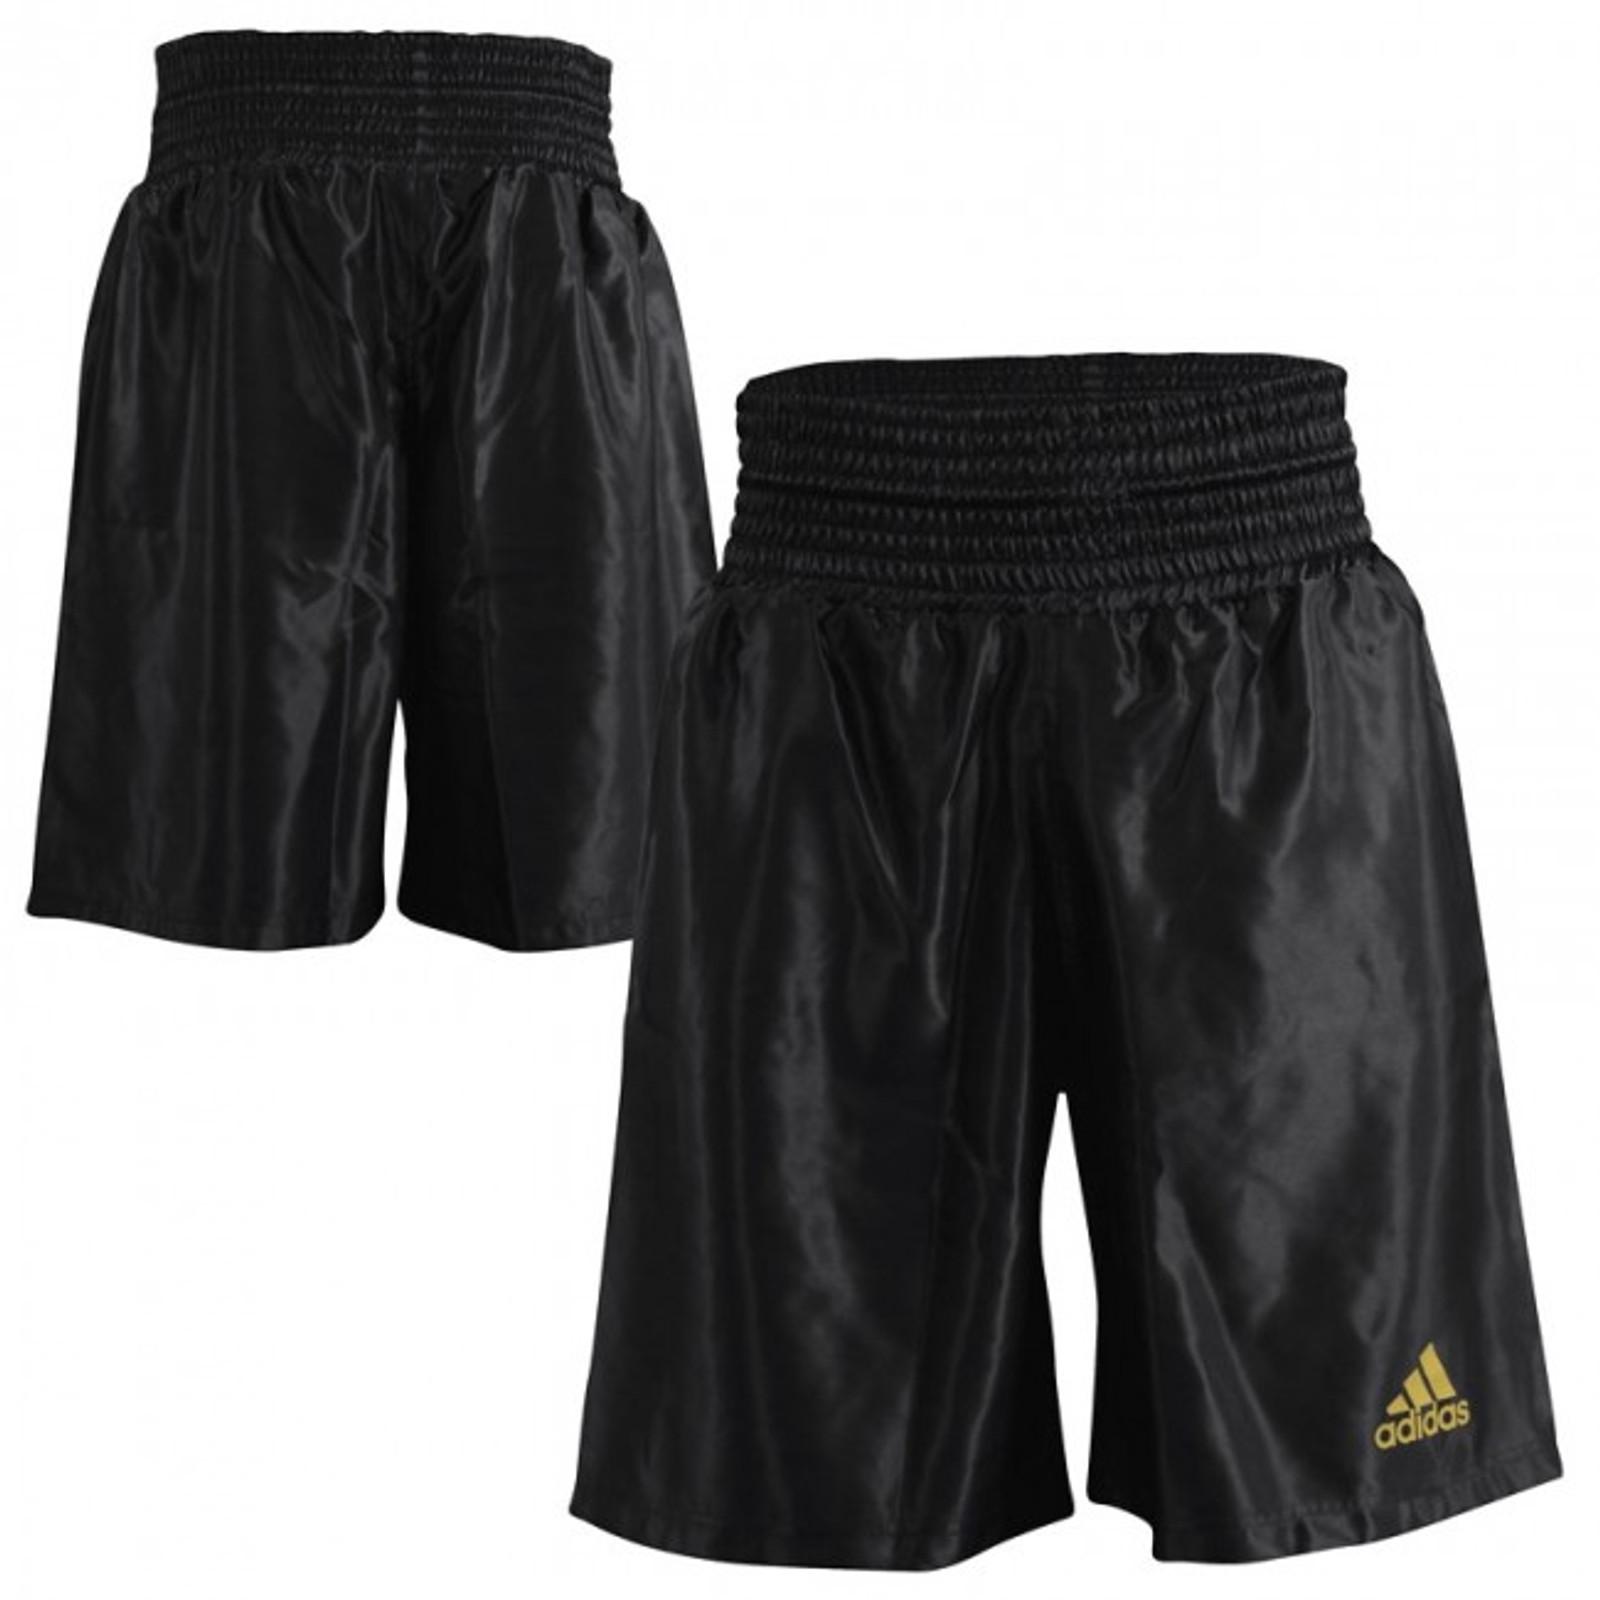 adidas Box Shorts Multiboxing